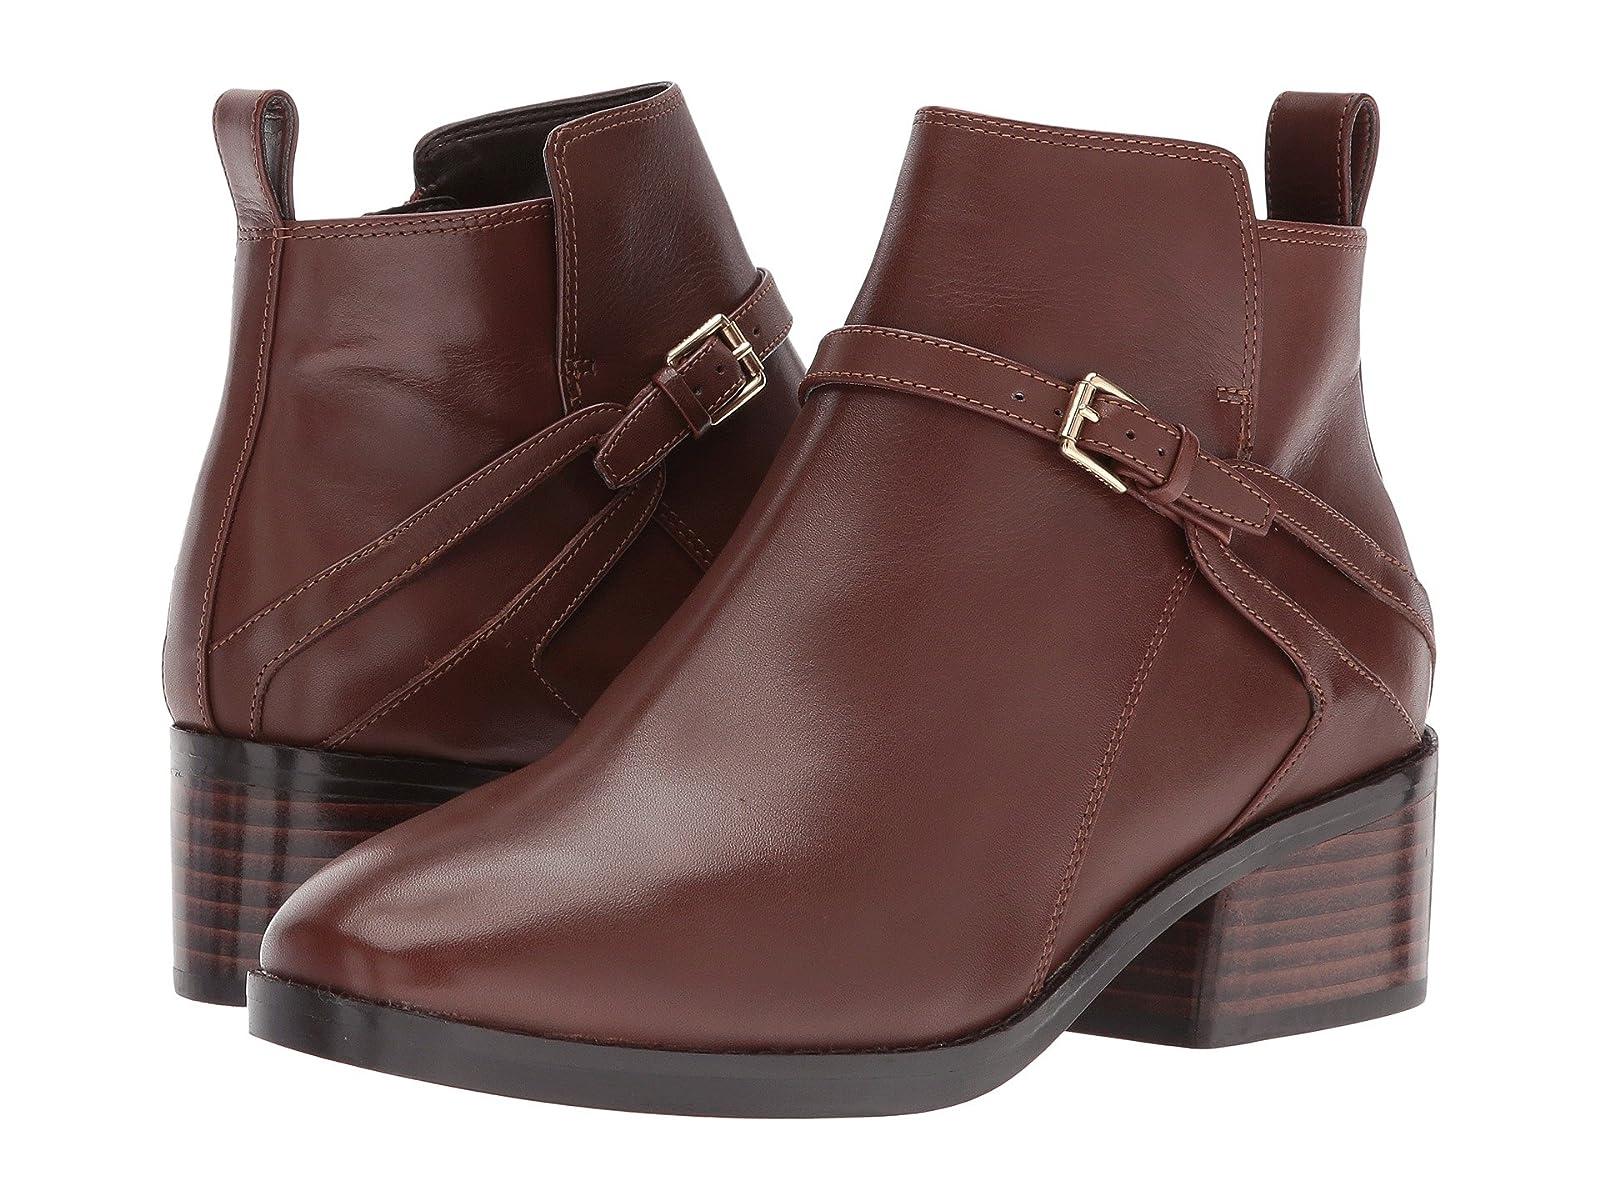 Cole Haan Etta Bootie IICheap and distinctive eye-catching shoes